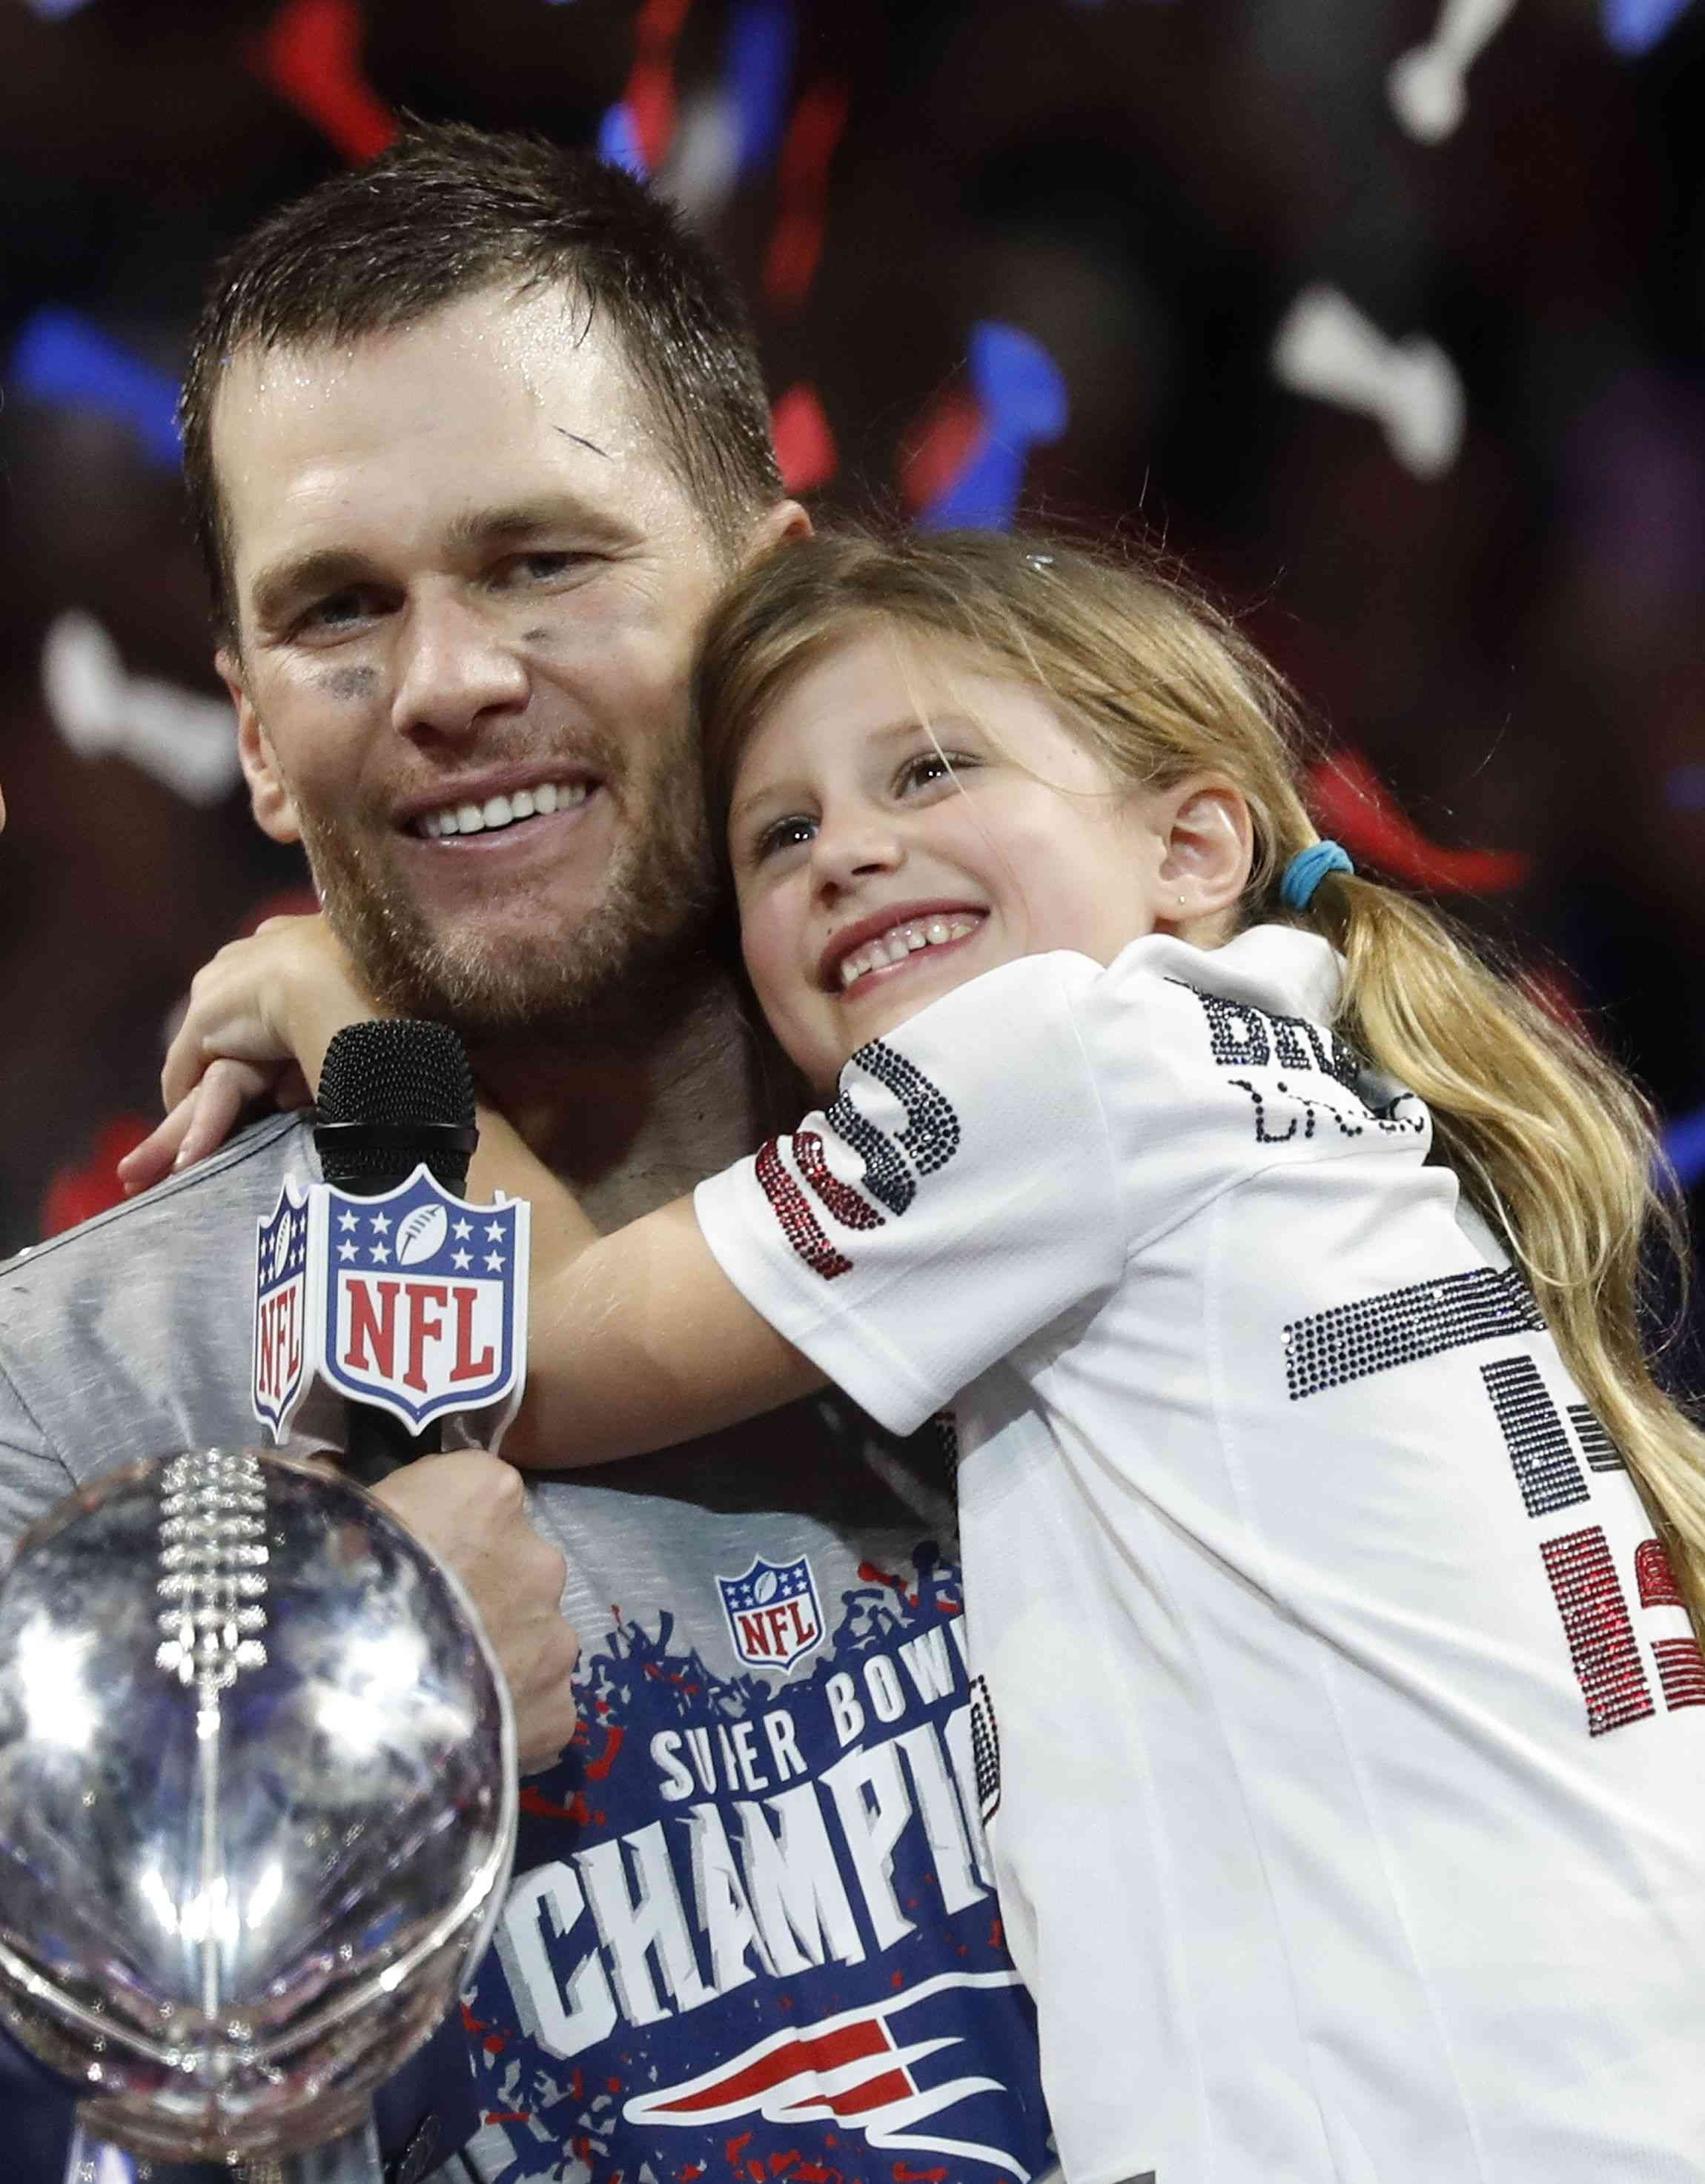 Super Bowl 2019: Tom Brady Feiert 6. Titel Mit Seiner pertaining to Super Bowl 2019 Tom Brady